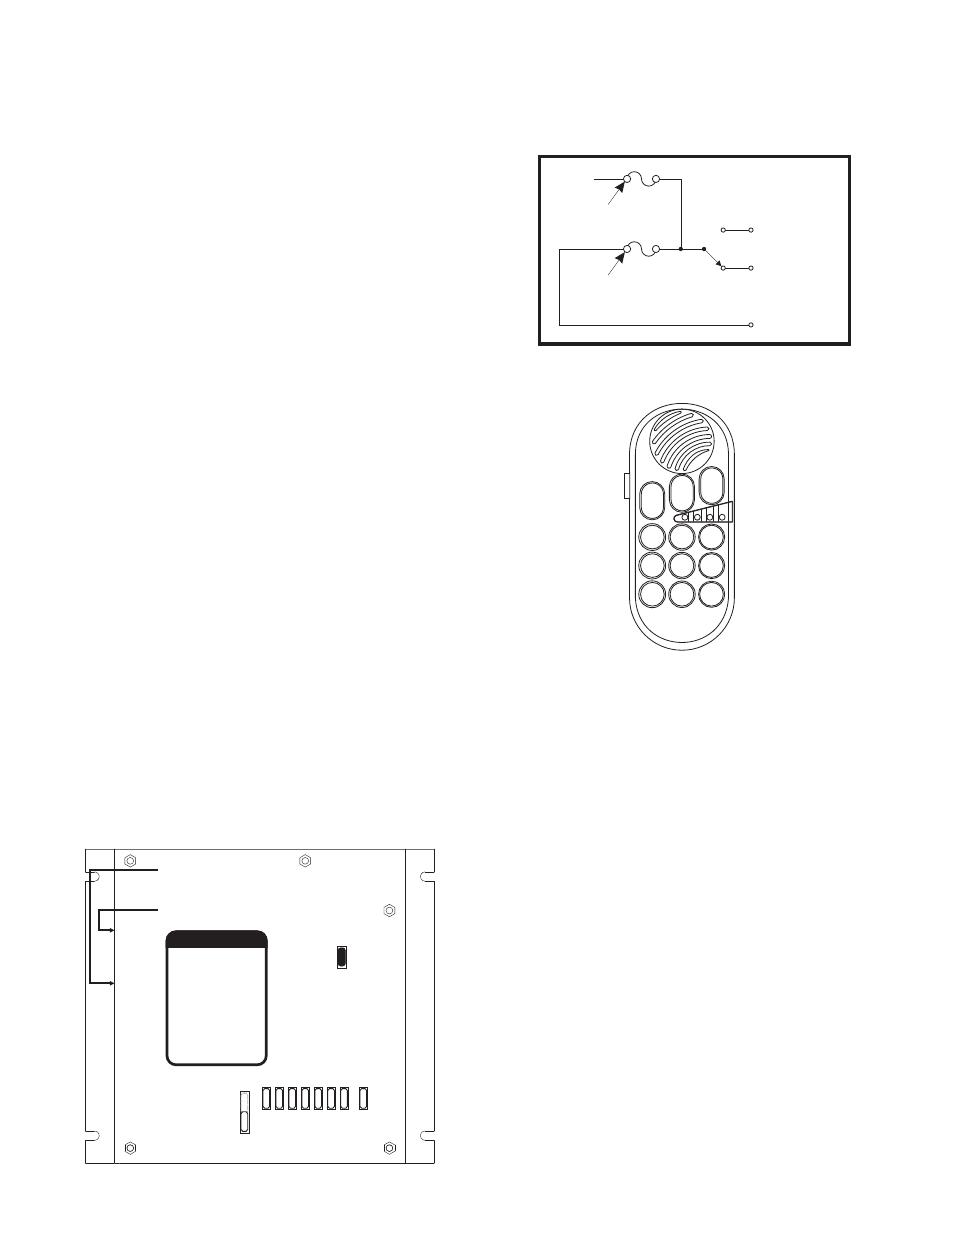 Hands-free siren (items 33 & 37) (optional), Pa volume